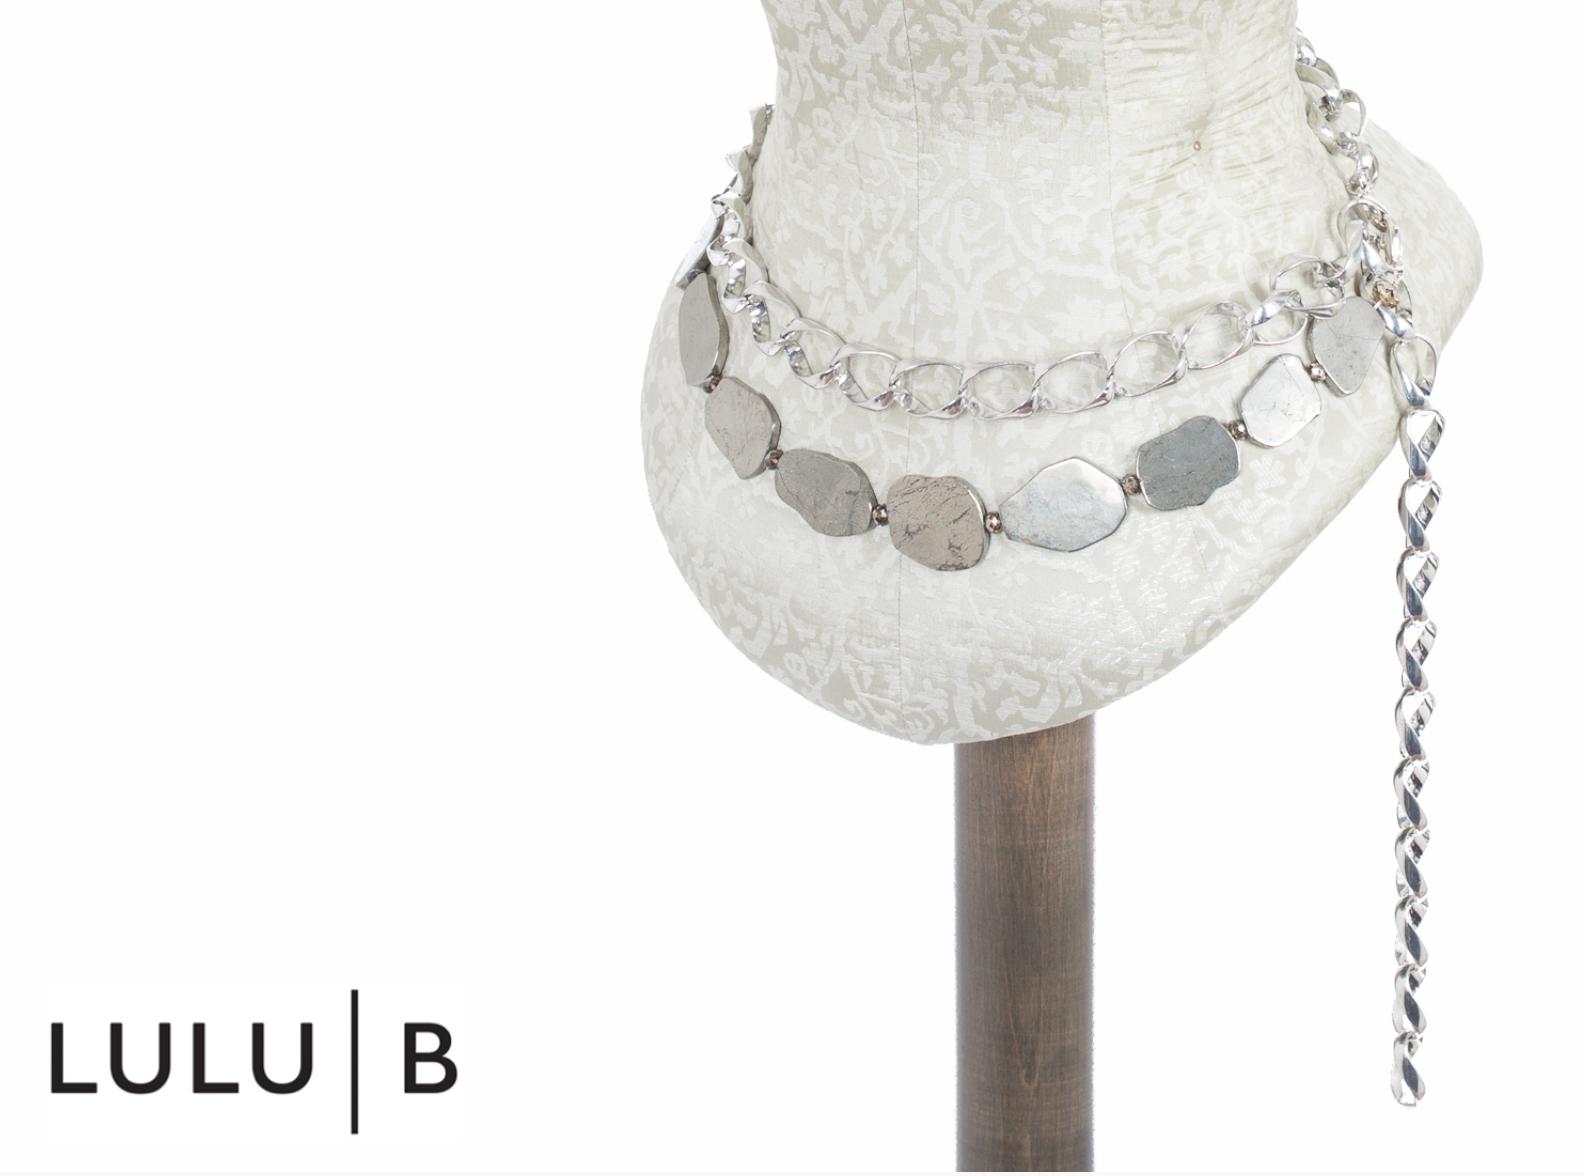 LuluB Designs